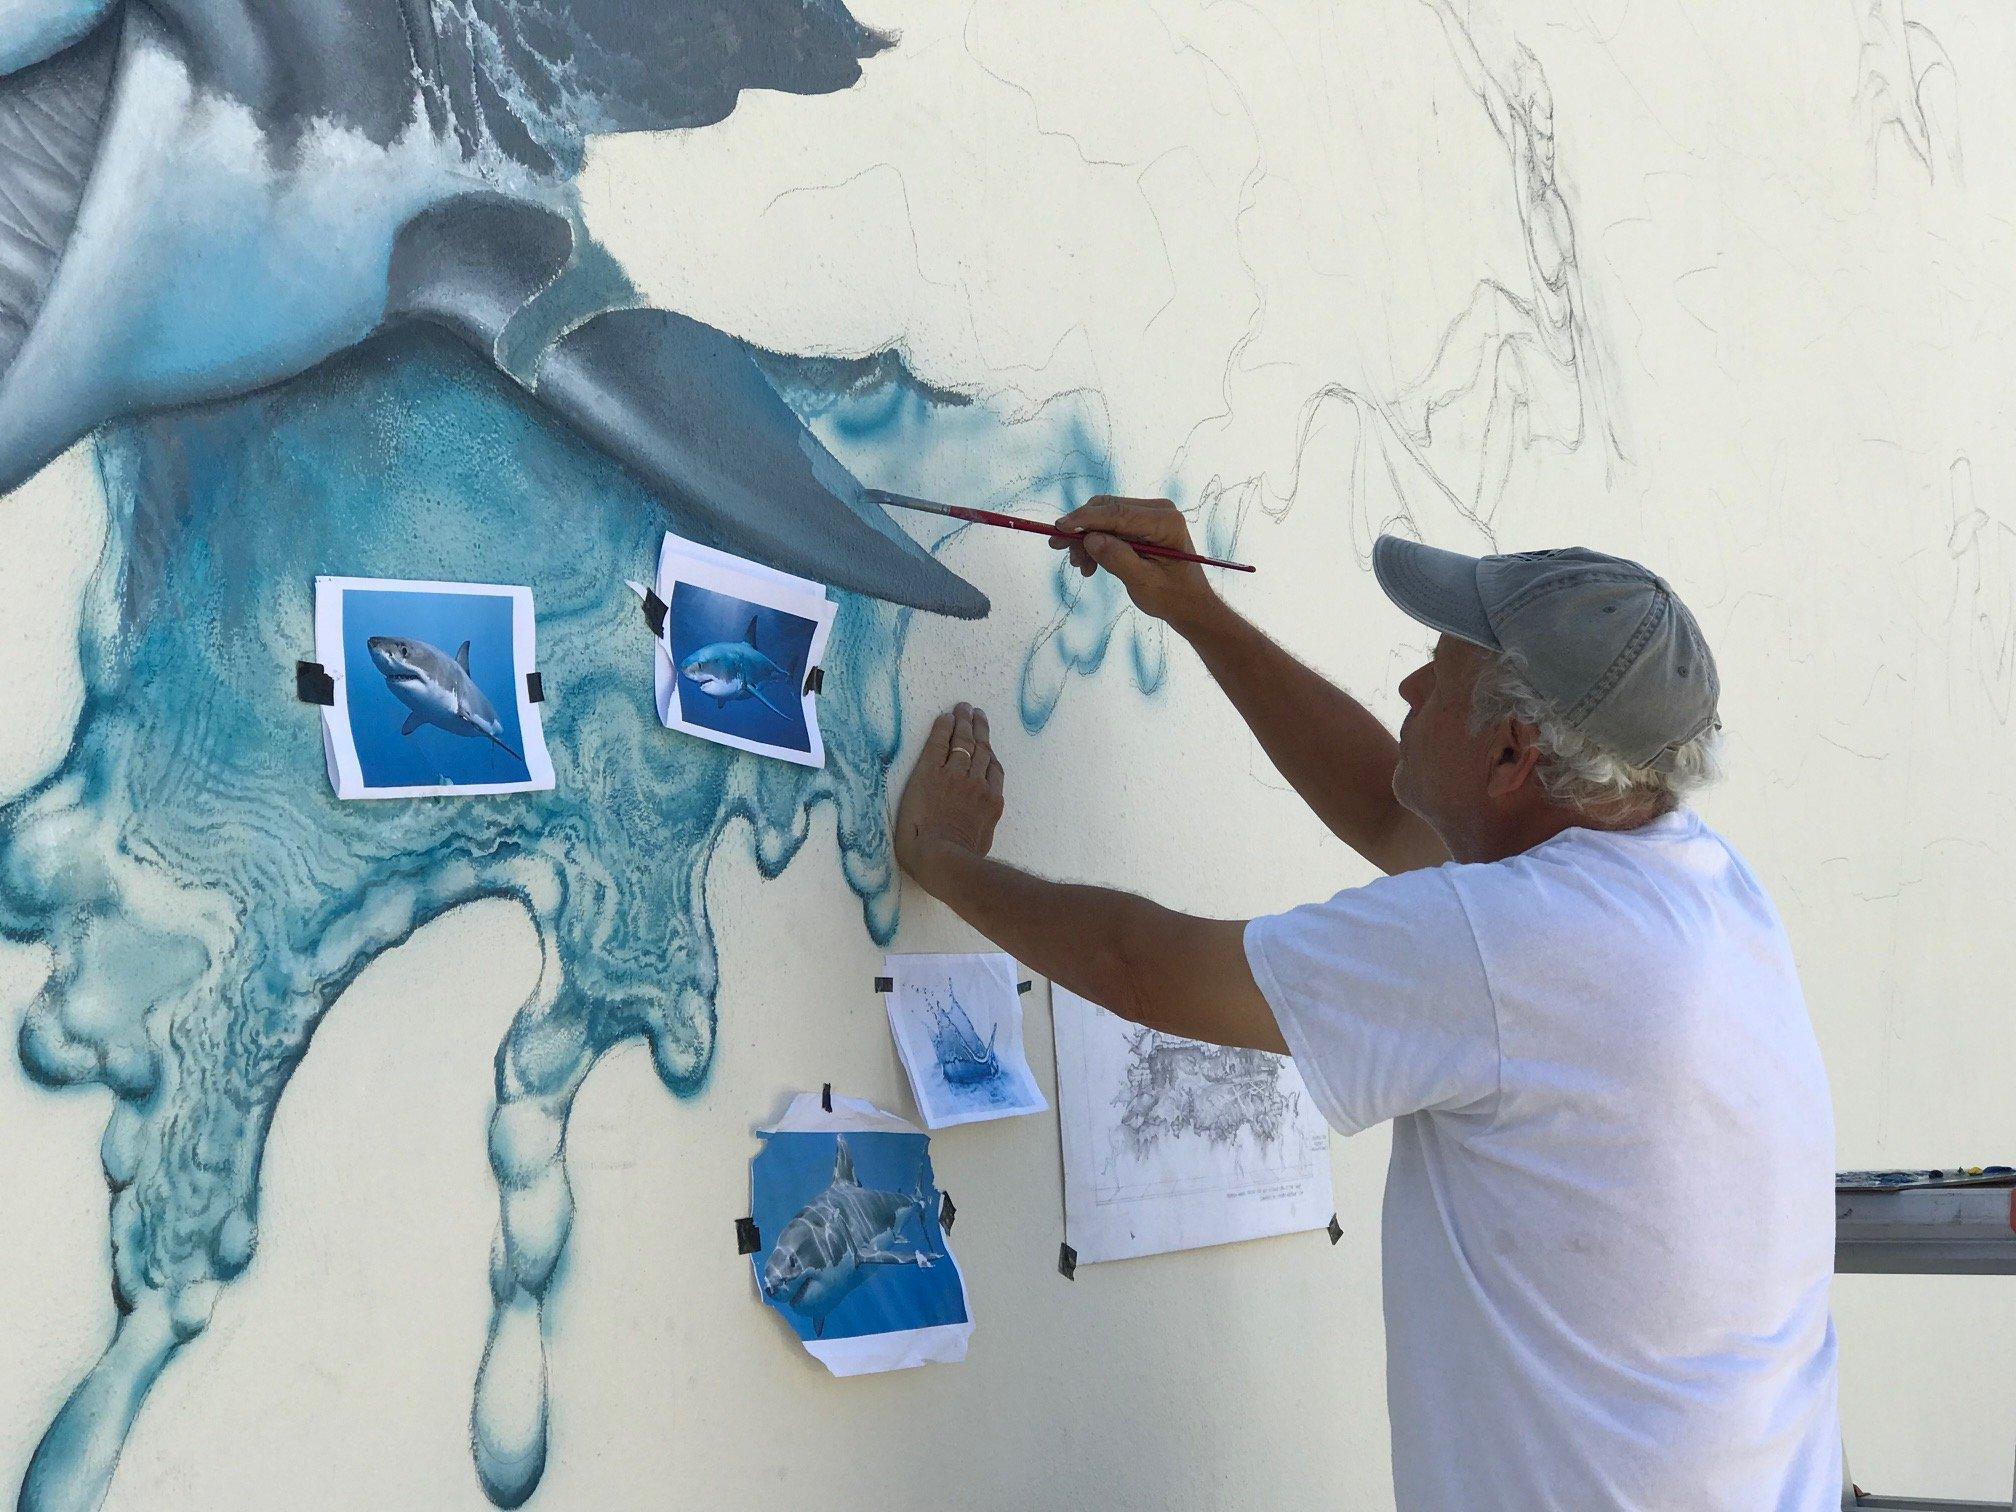 Steve painting 4-24 2